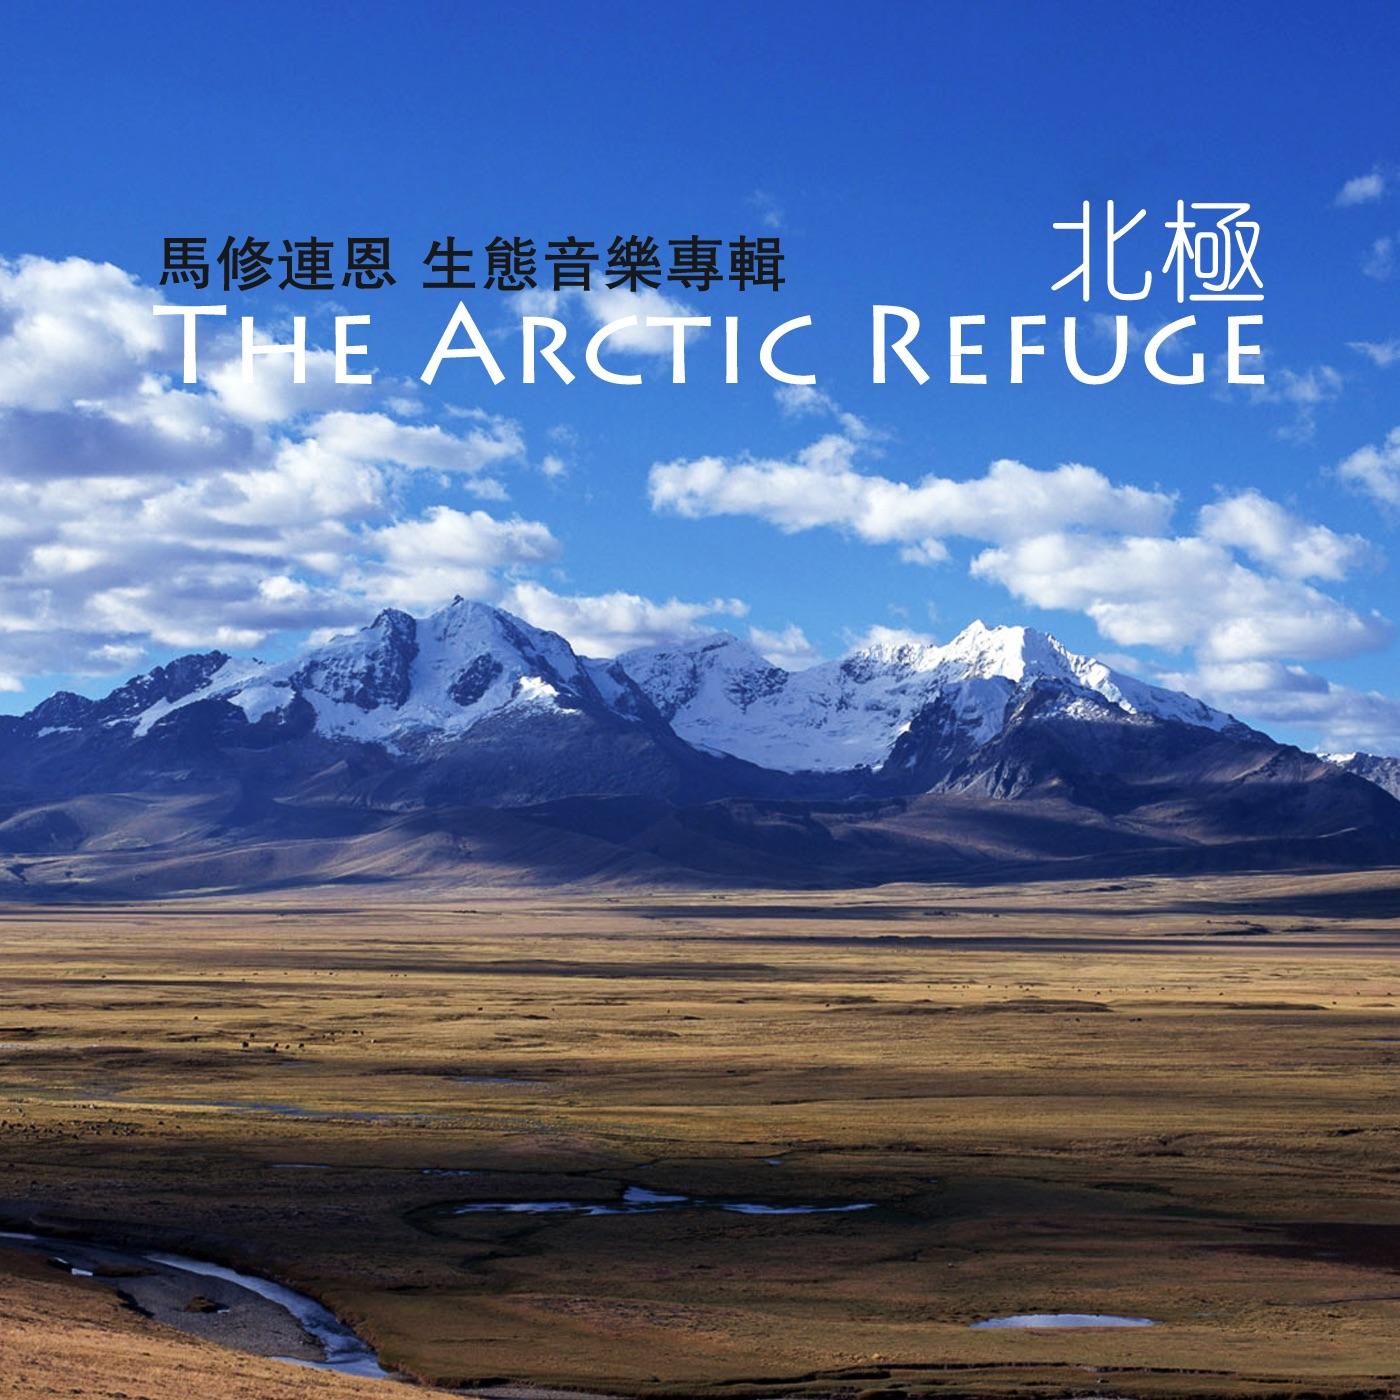 Heart of the Refuge